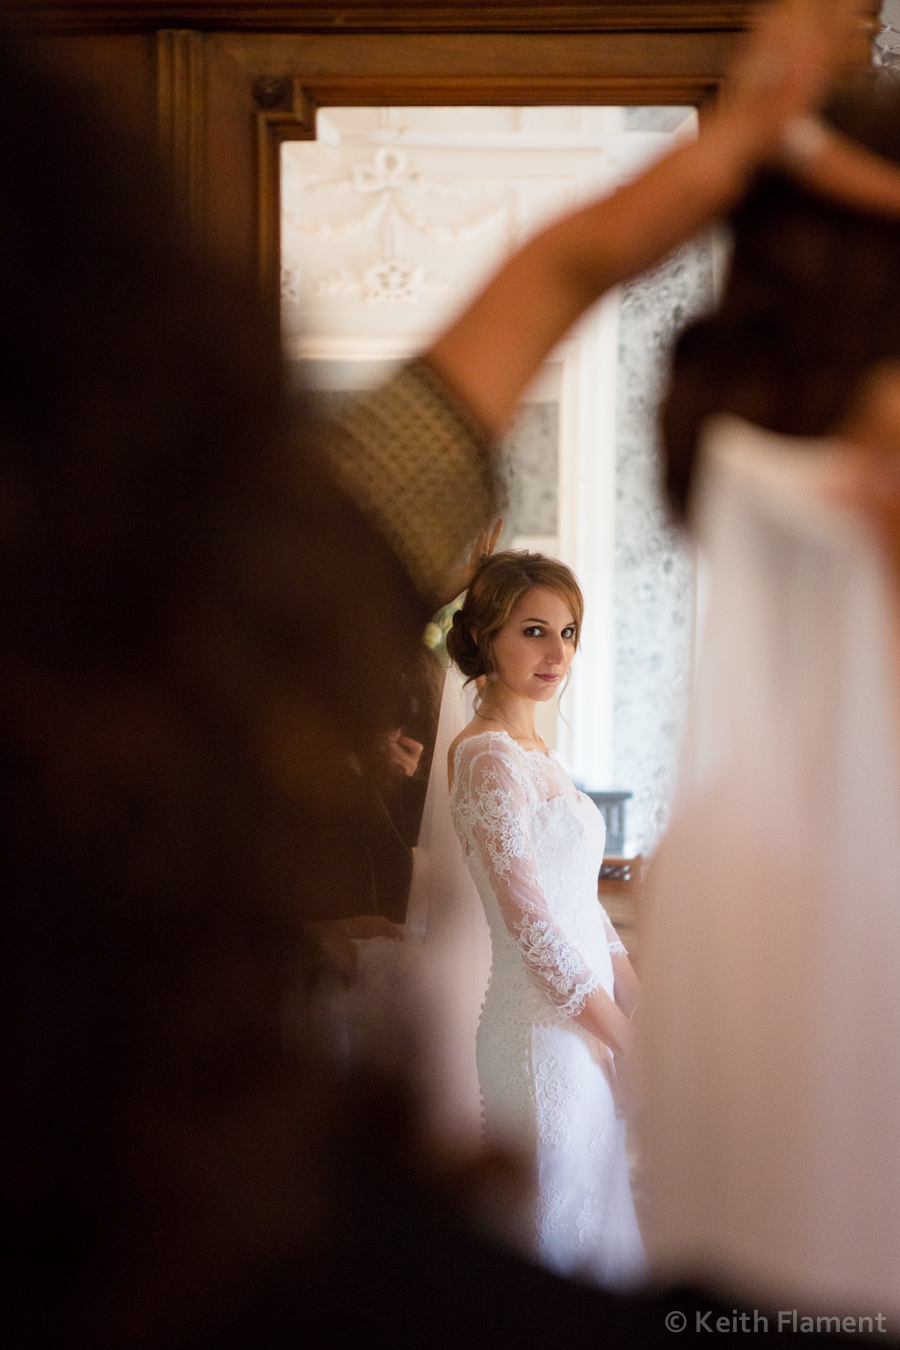 photographe-reportage-mariage-keith-flament-chateau-aveny-bourgogne-14